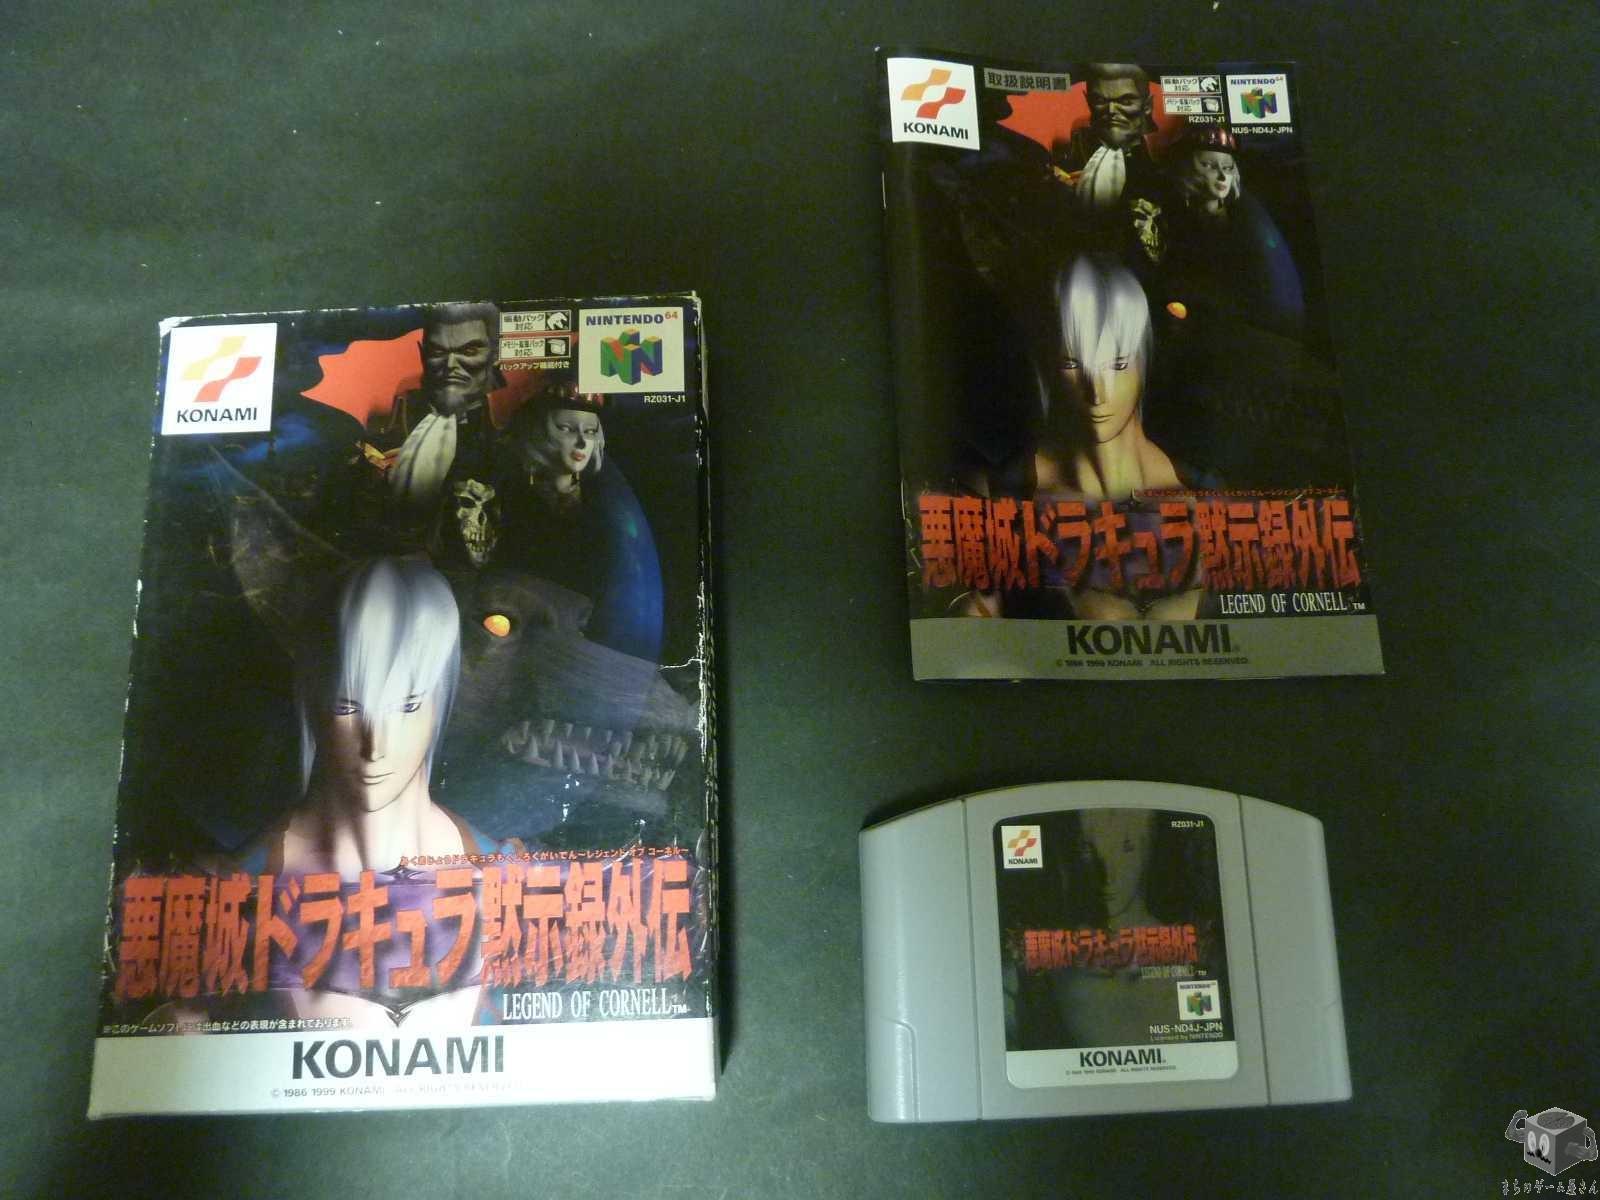 [N64] Castlevania Apocalypse  legend of cornell - Akumajou Dracula Mokushi Roku